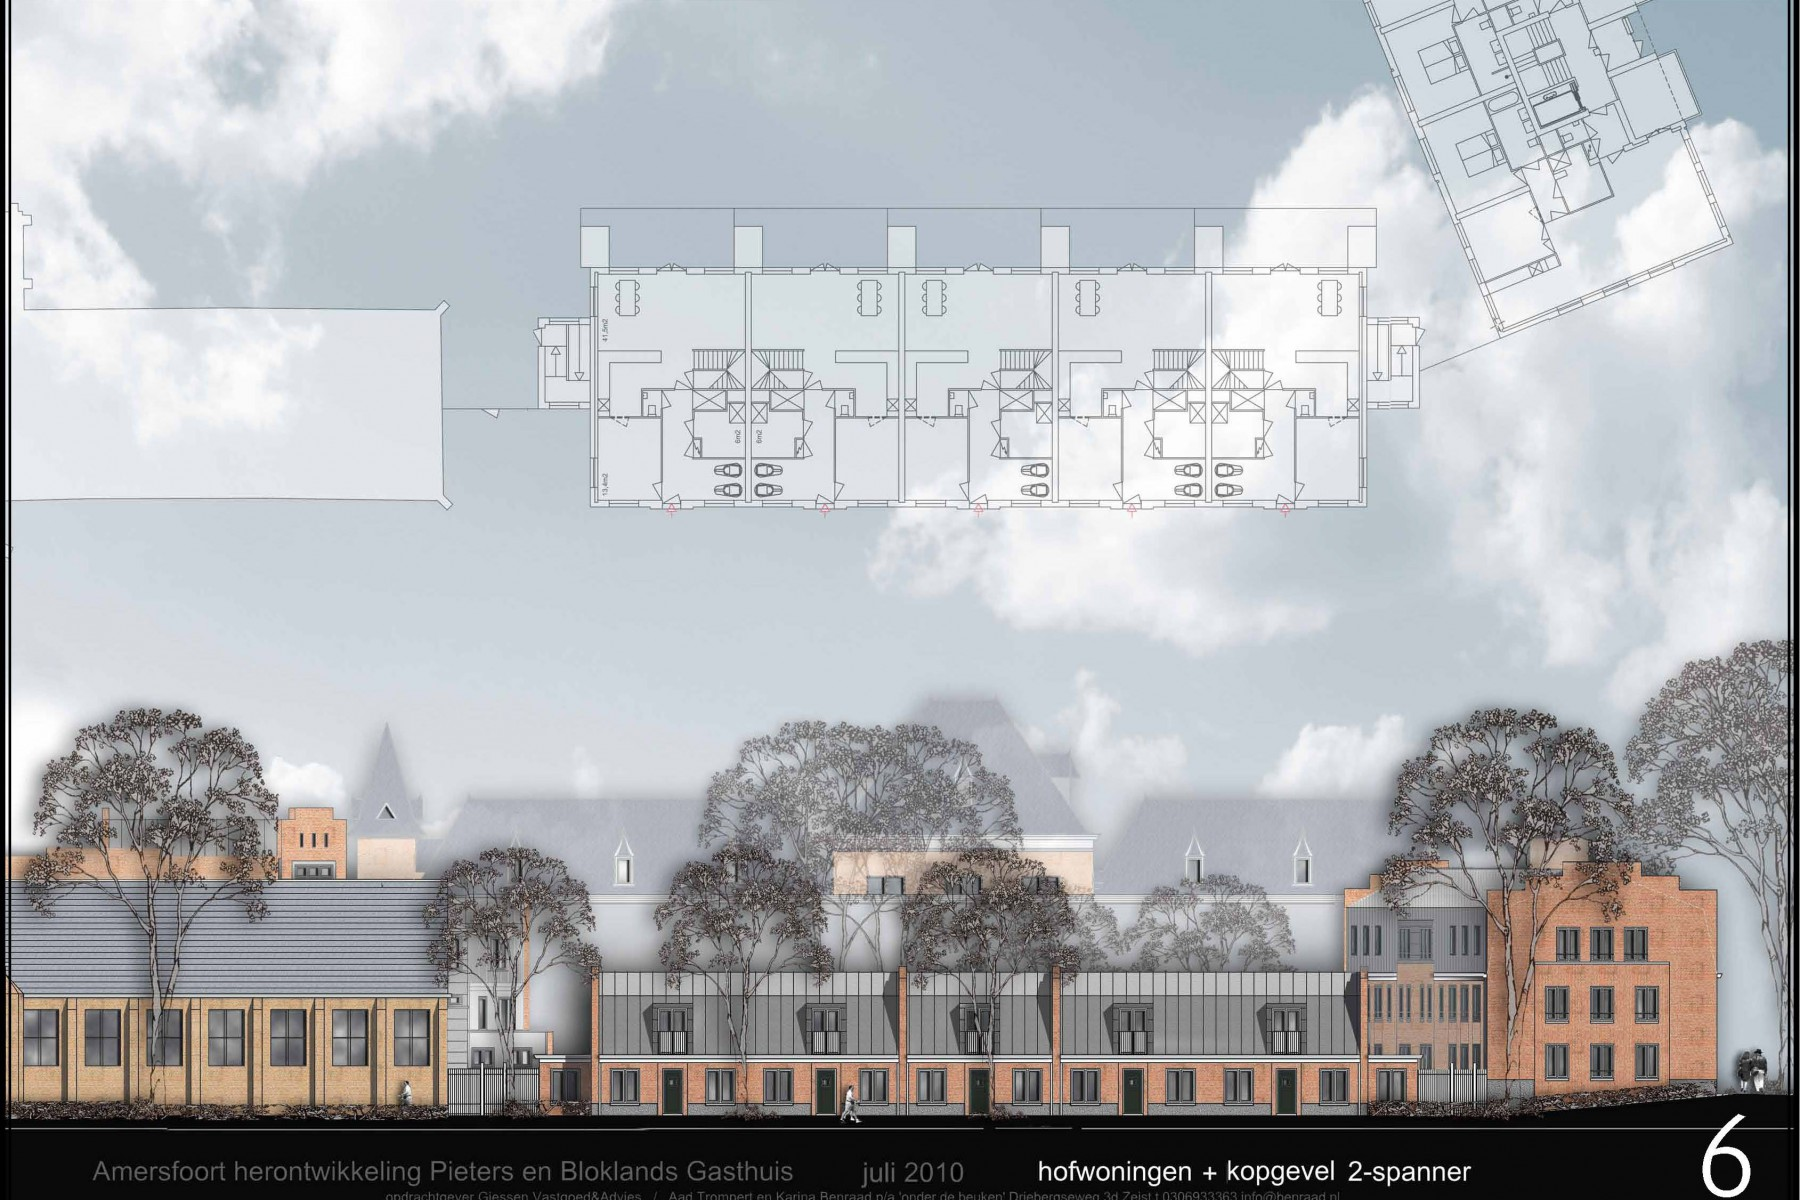 Amersfoort, St. Pieters en Bloklands Gasthuis